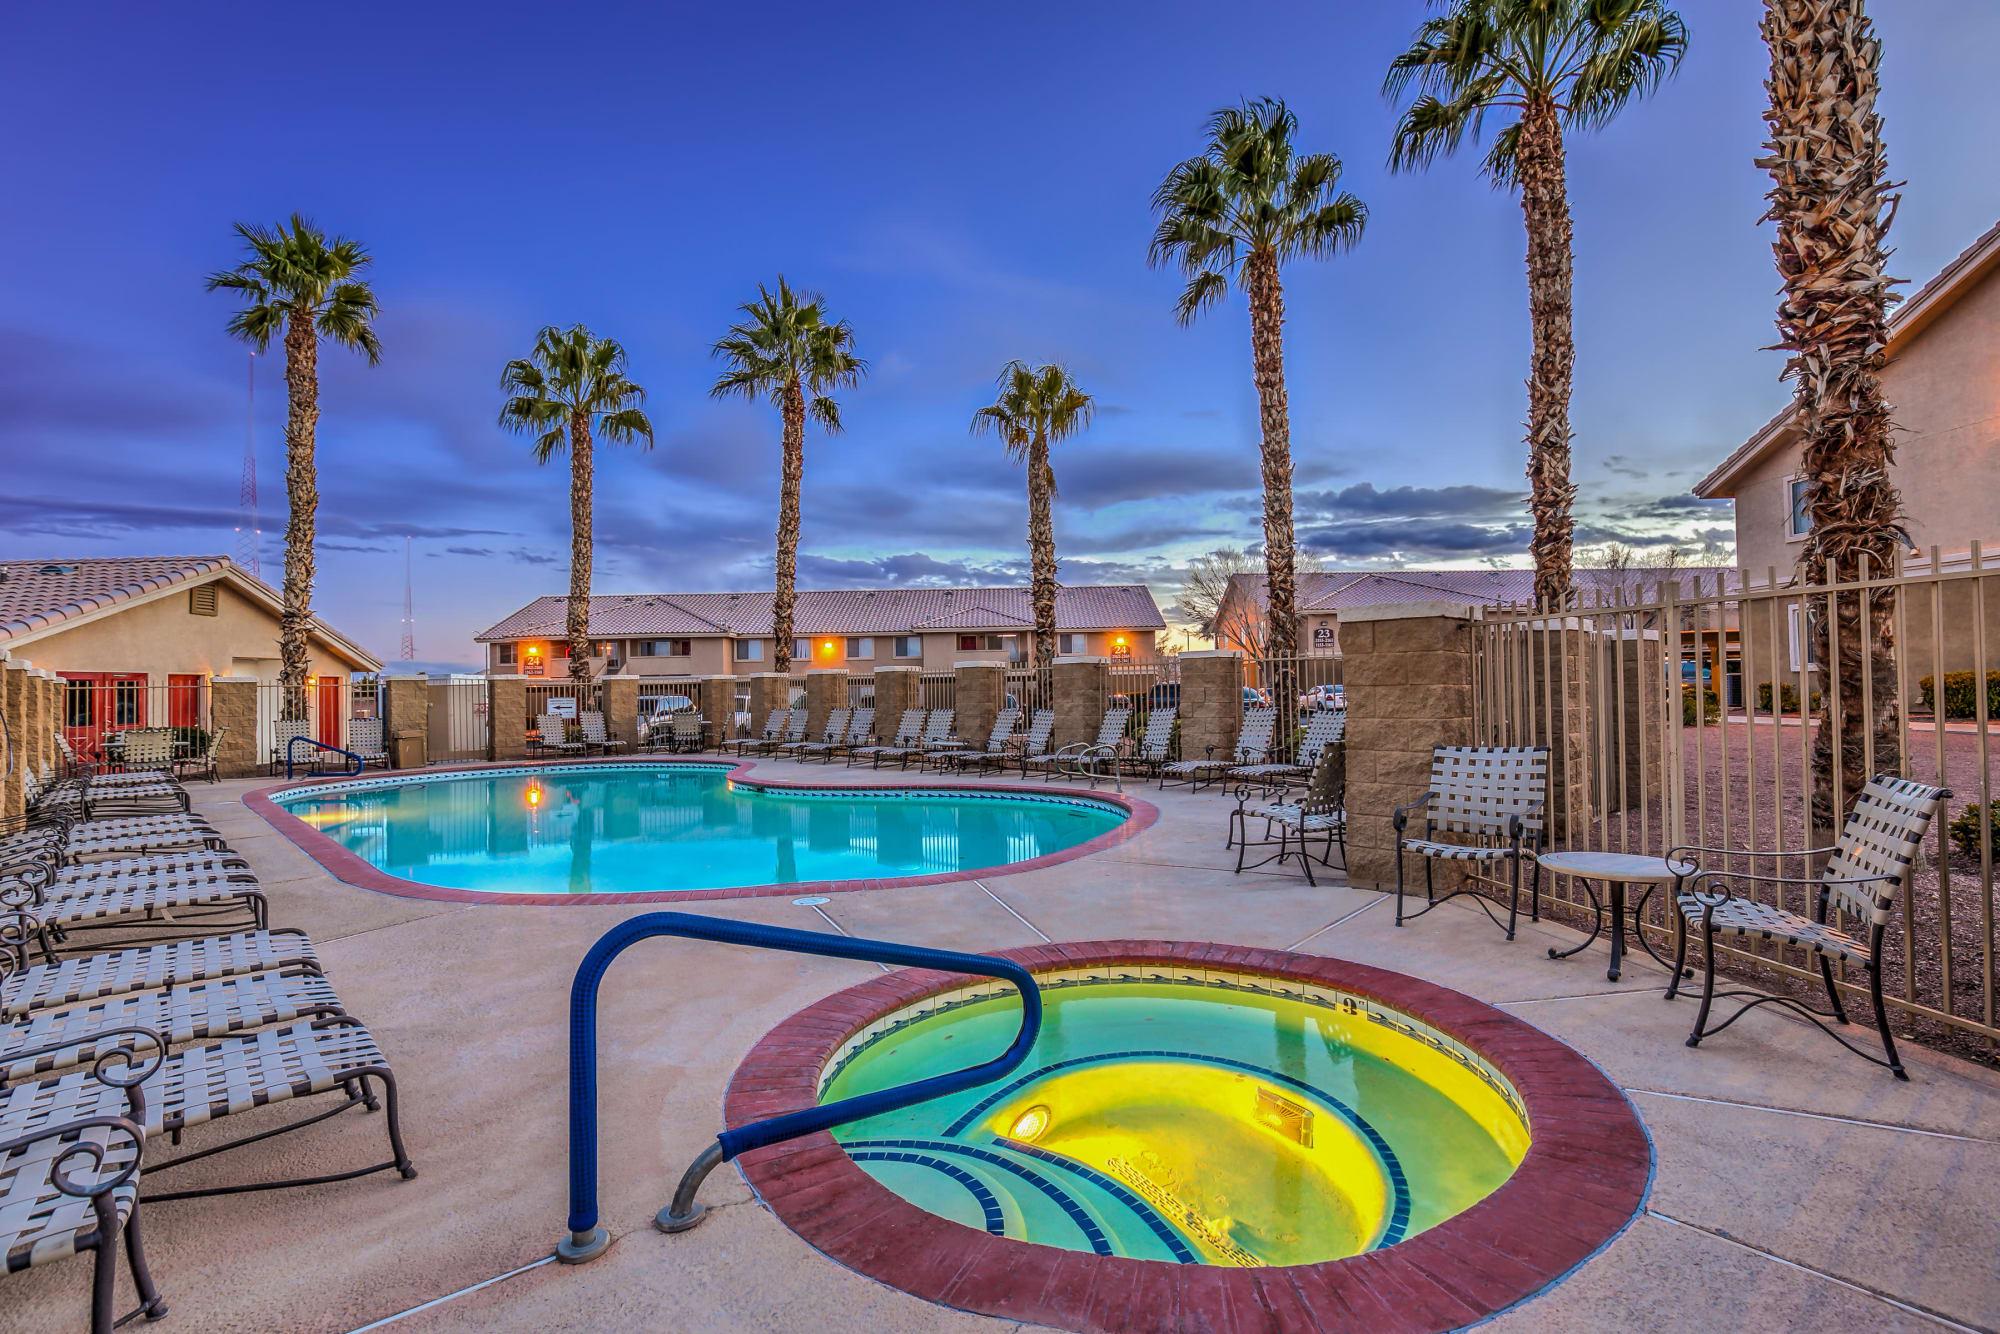 Pool at dusk at Portola Del Sol in Las Vegas